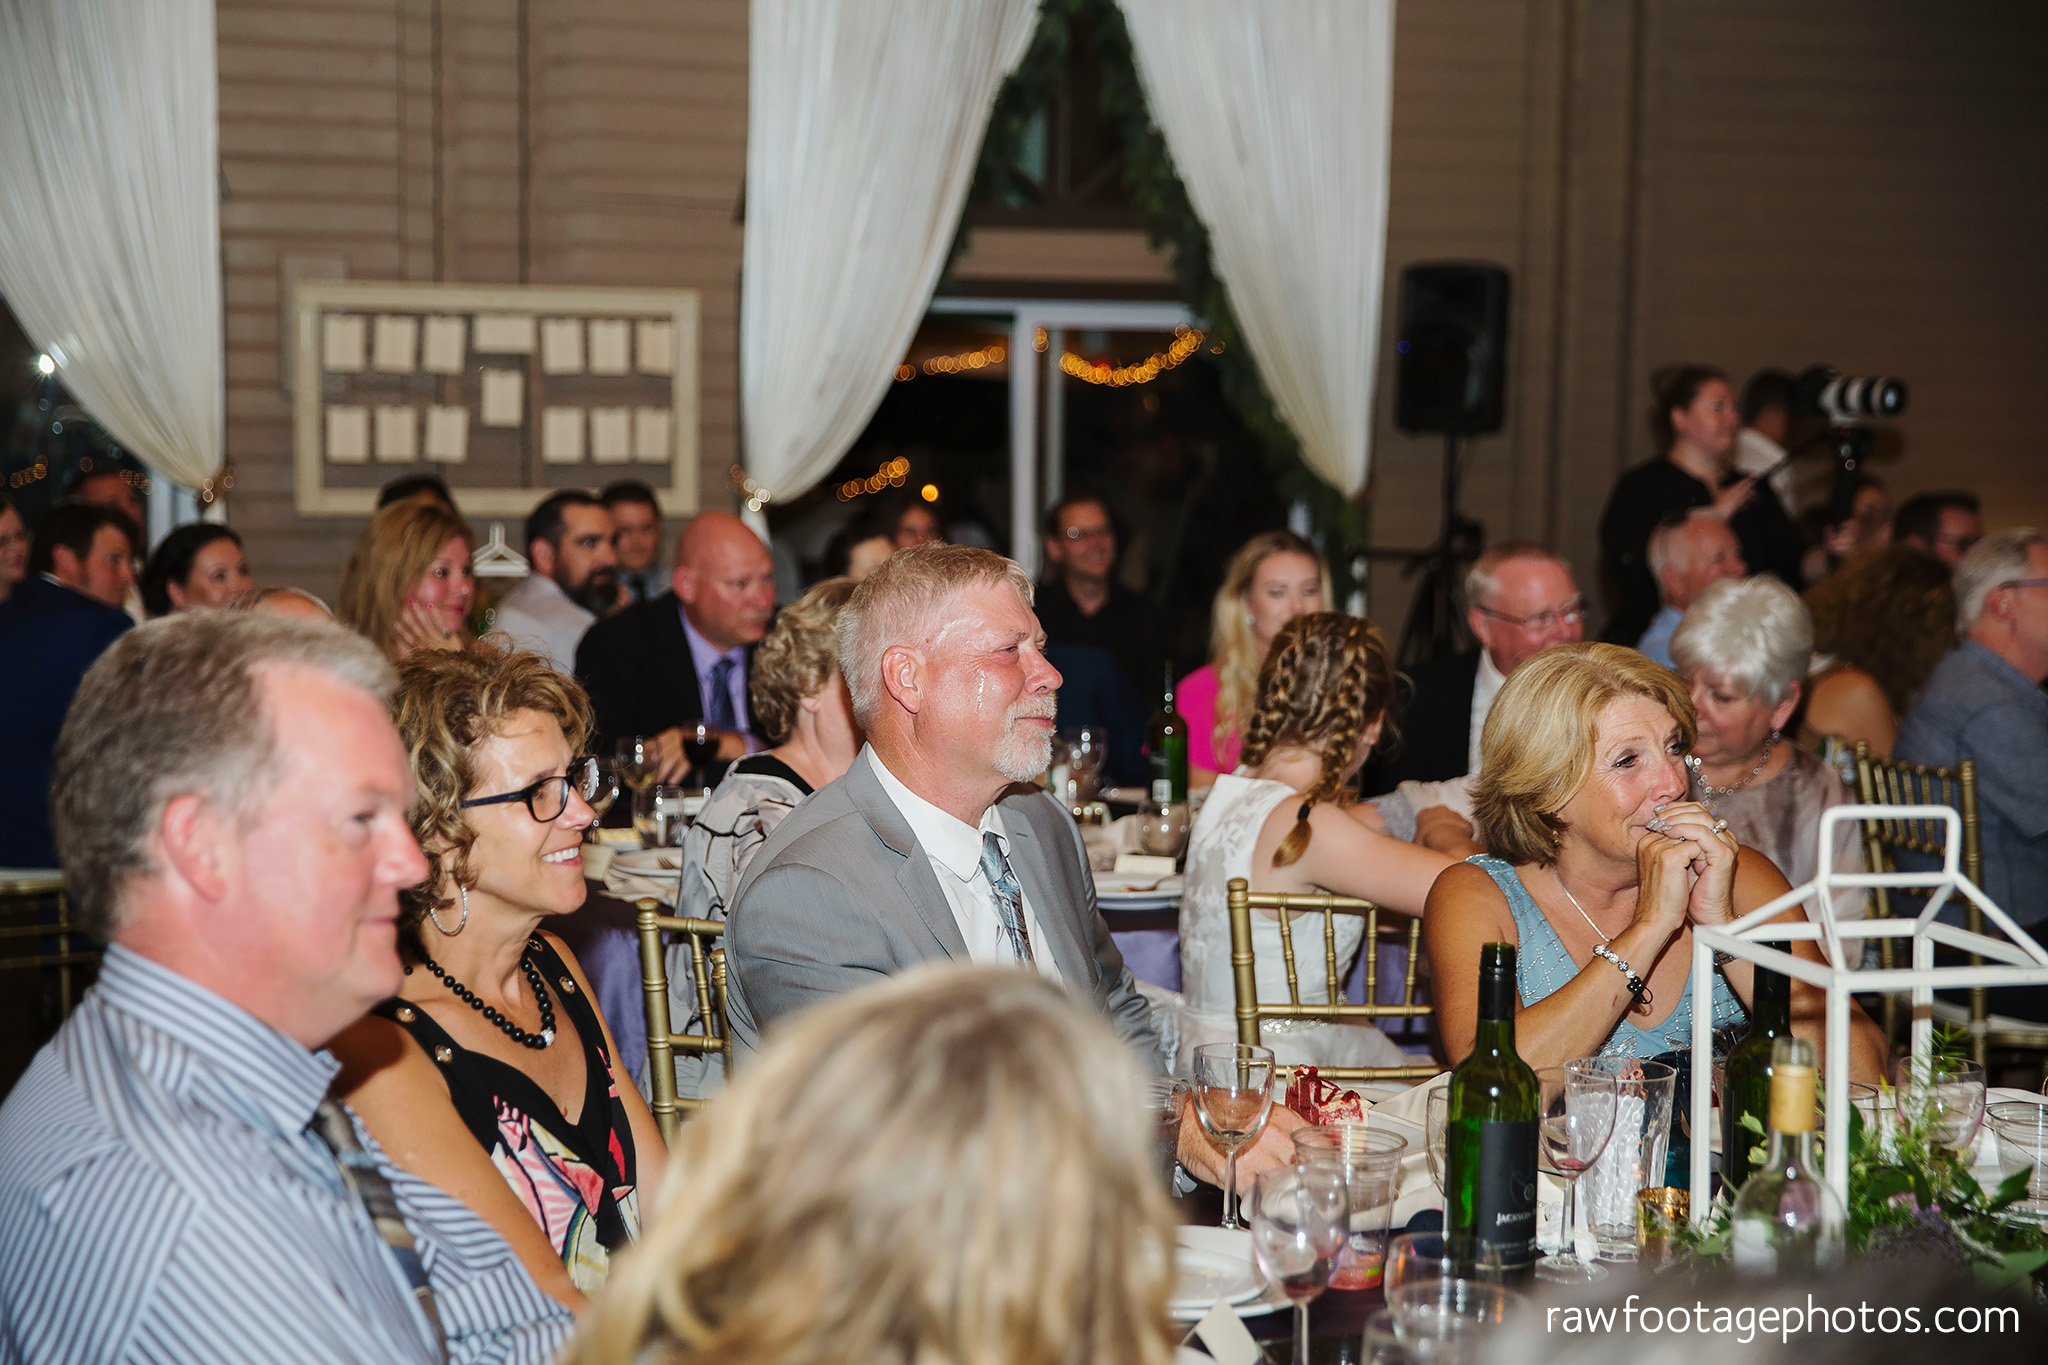 london_ontario_wedding_photographer-grand_bend_wedding_photographer-oakwood_resort_wedding-beach_wedding-sunset_wedding-raw_footage_photography075.jpg